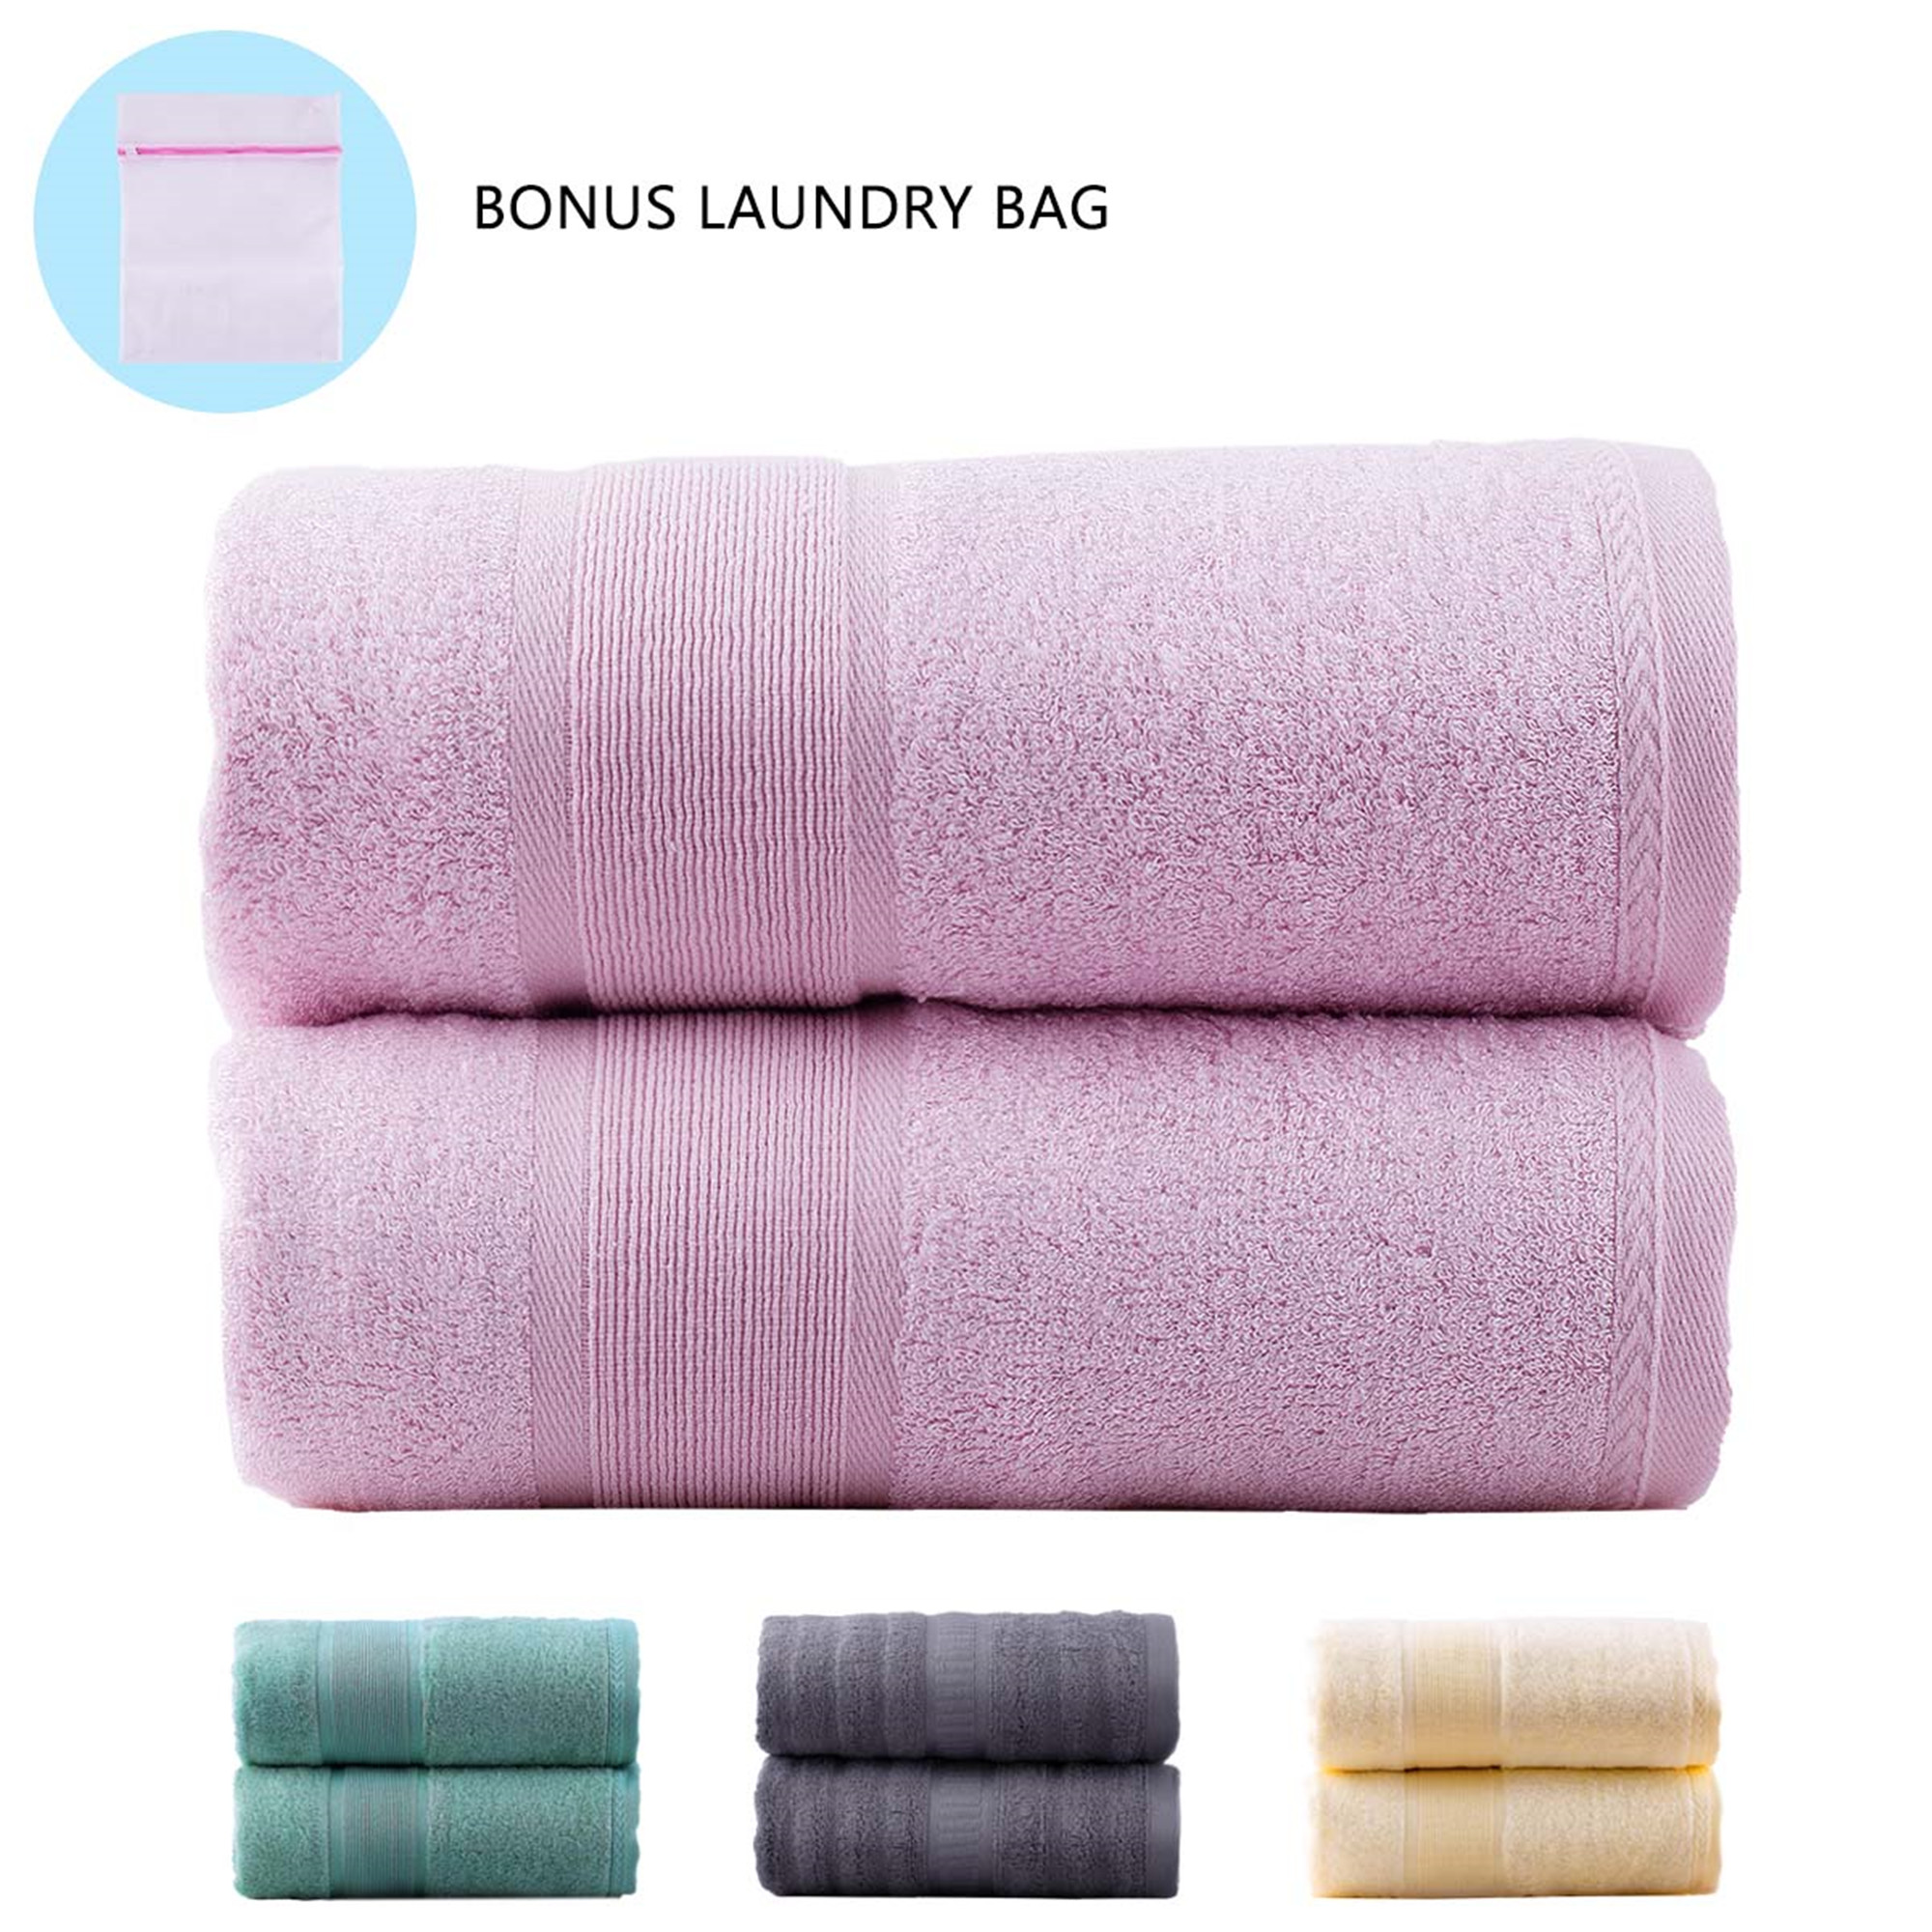 "Soft 2 Pcs Bamboo Cotton Blend Bath Towel Set (27""x55"") Antibacterial & Hypoallergenic, Soft & Absorbent, Odor Free, Skin Friendly(Grey)"